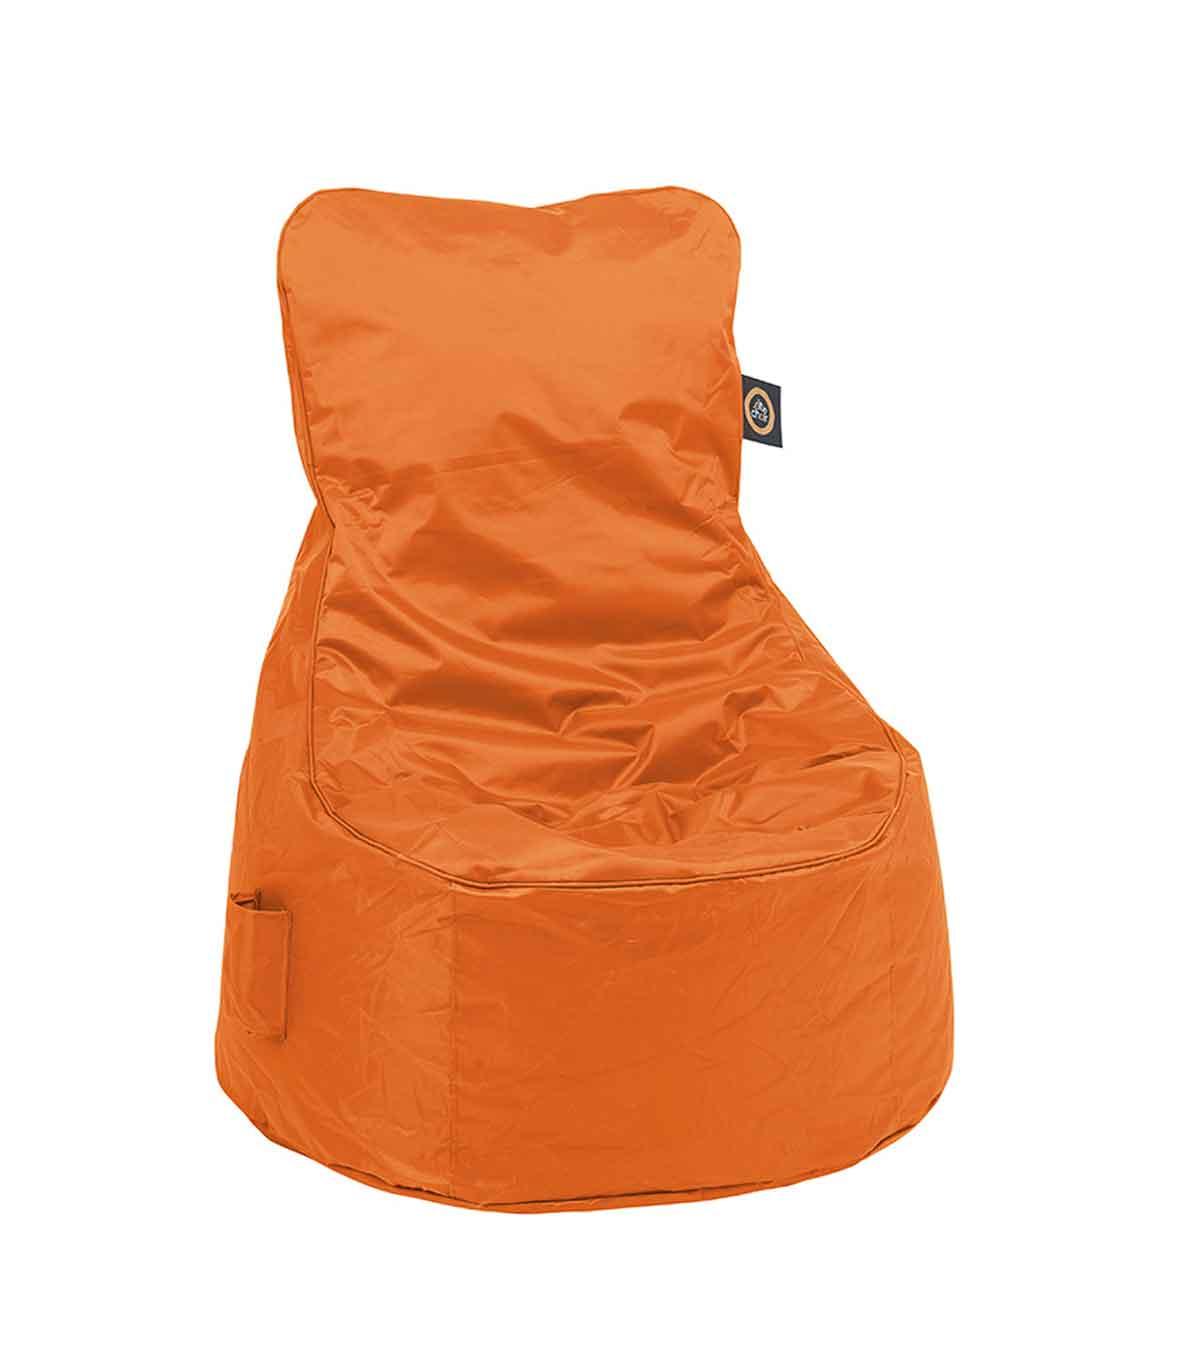 Chaise Gonflable Confort - Orange - 60 x 90 x 90 cm